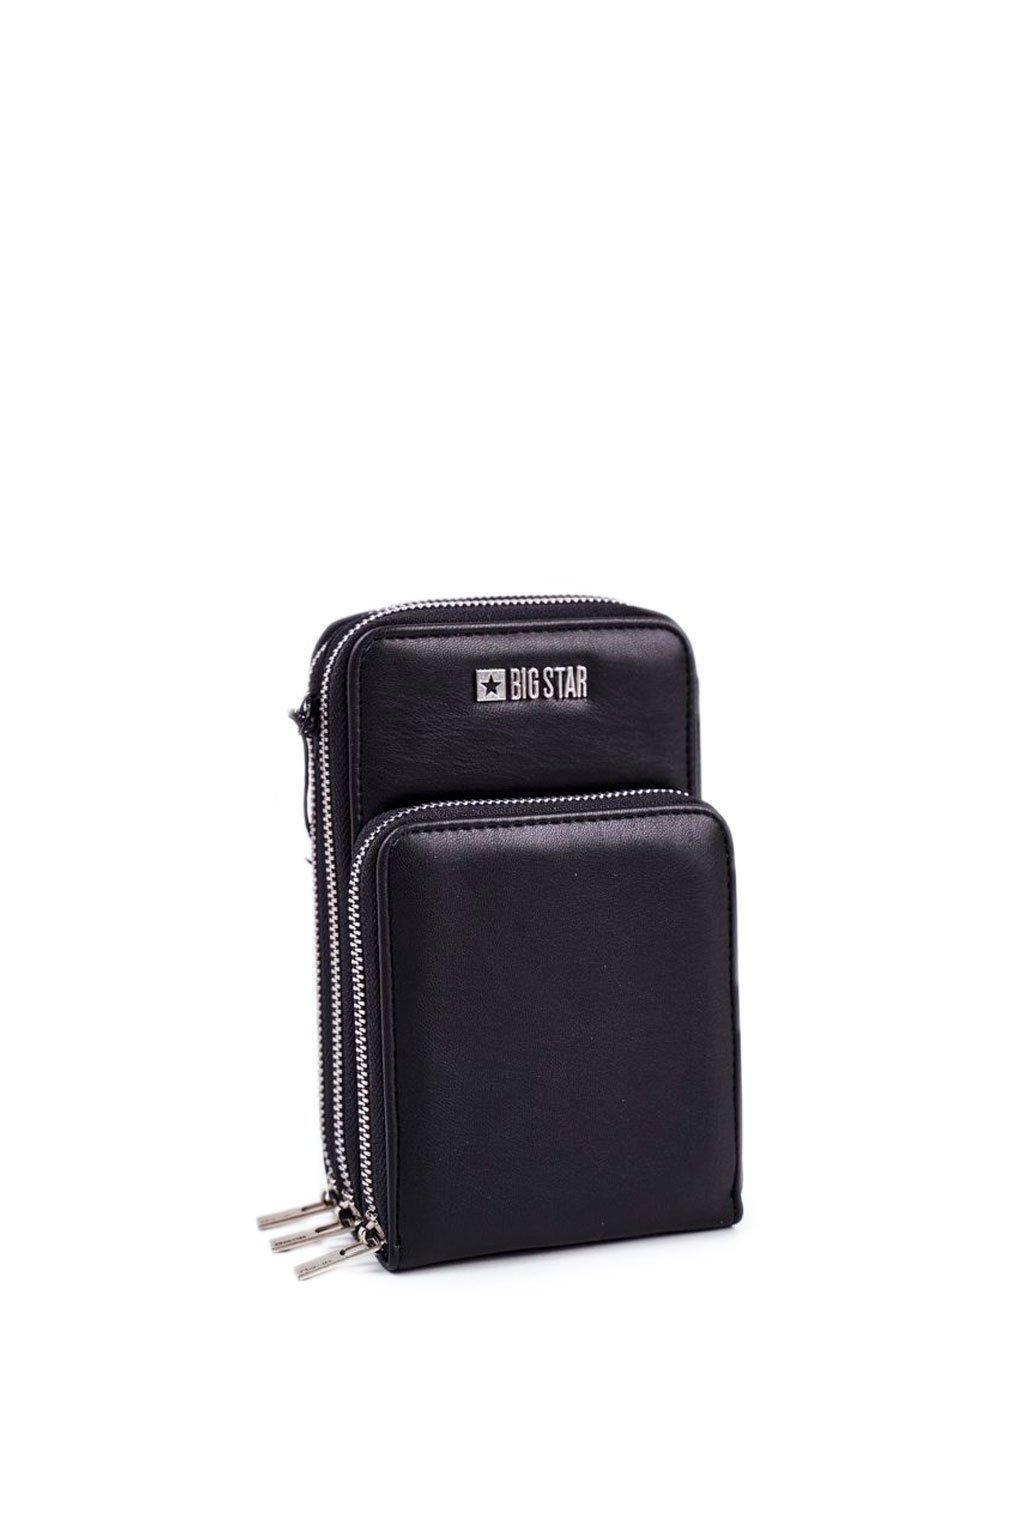 Dámska kabelka čierna kód kabelky GG674004 BLK